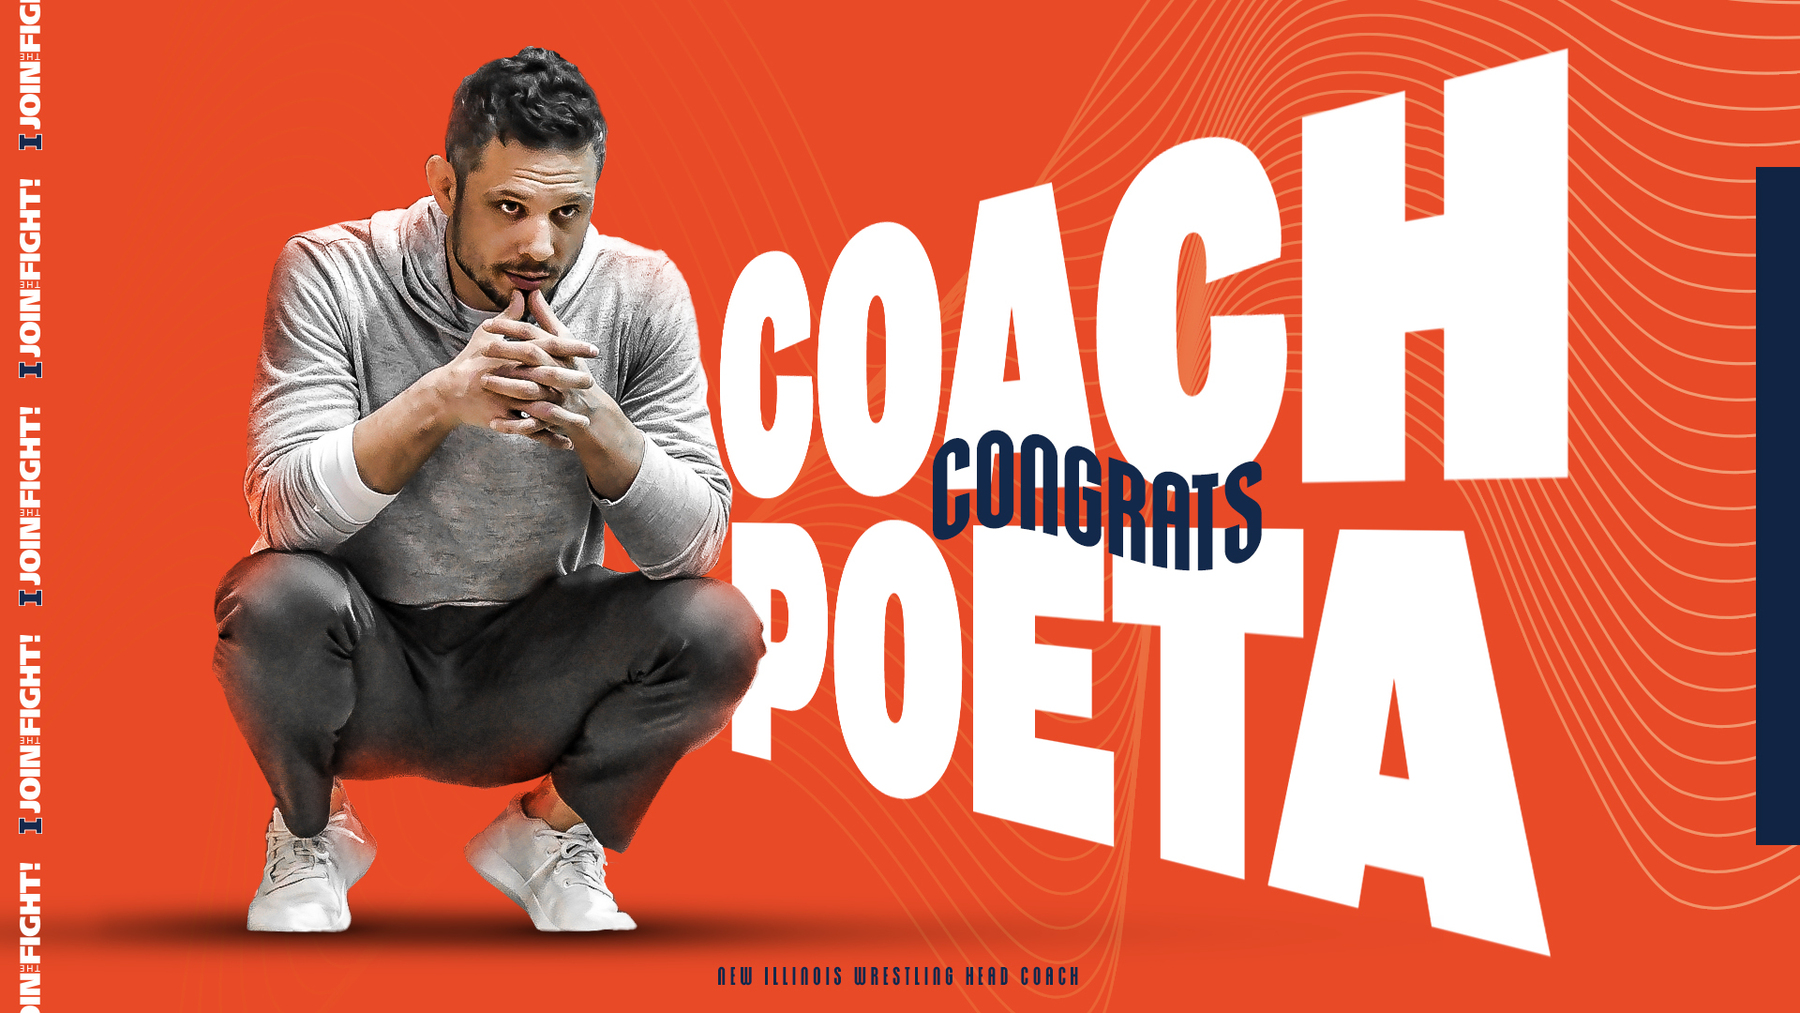 graphic: Congrats Mike Poeta